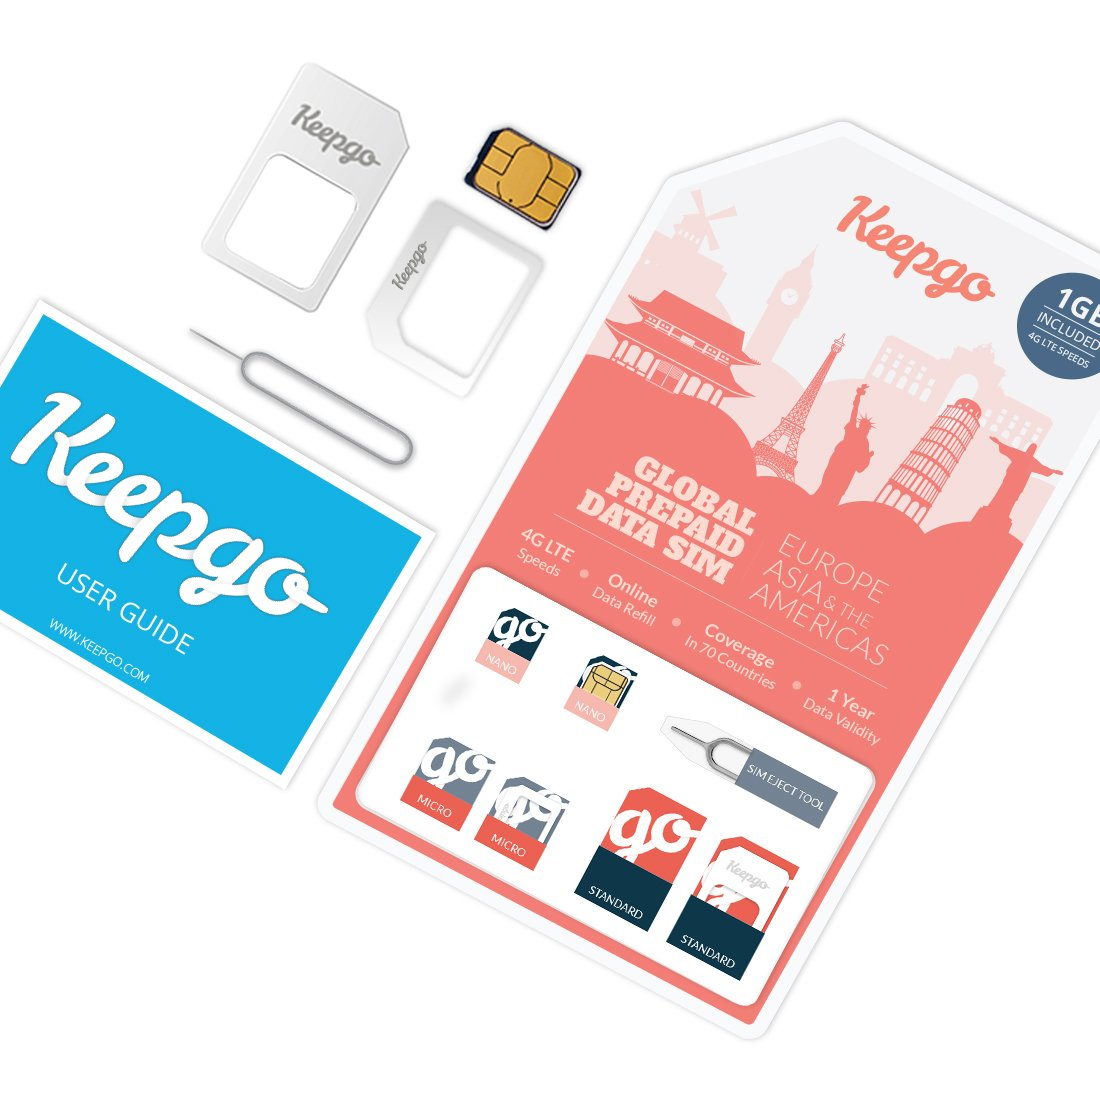 Keepgo Global Lifetime 4G LTE Data SIM Card for Europe, Asia & the Americas + 1GB credit